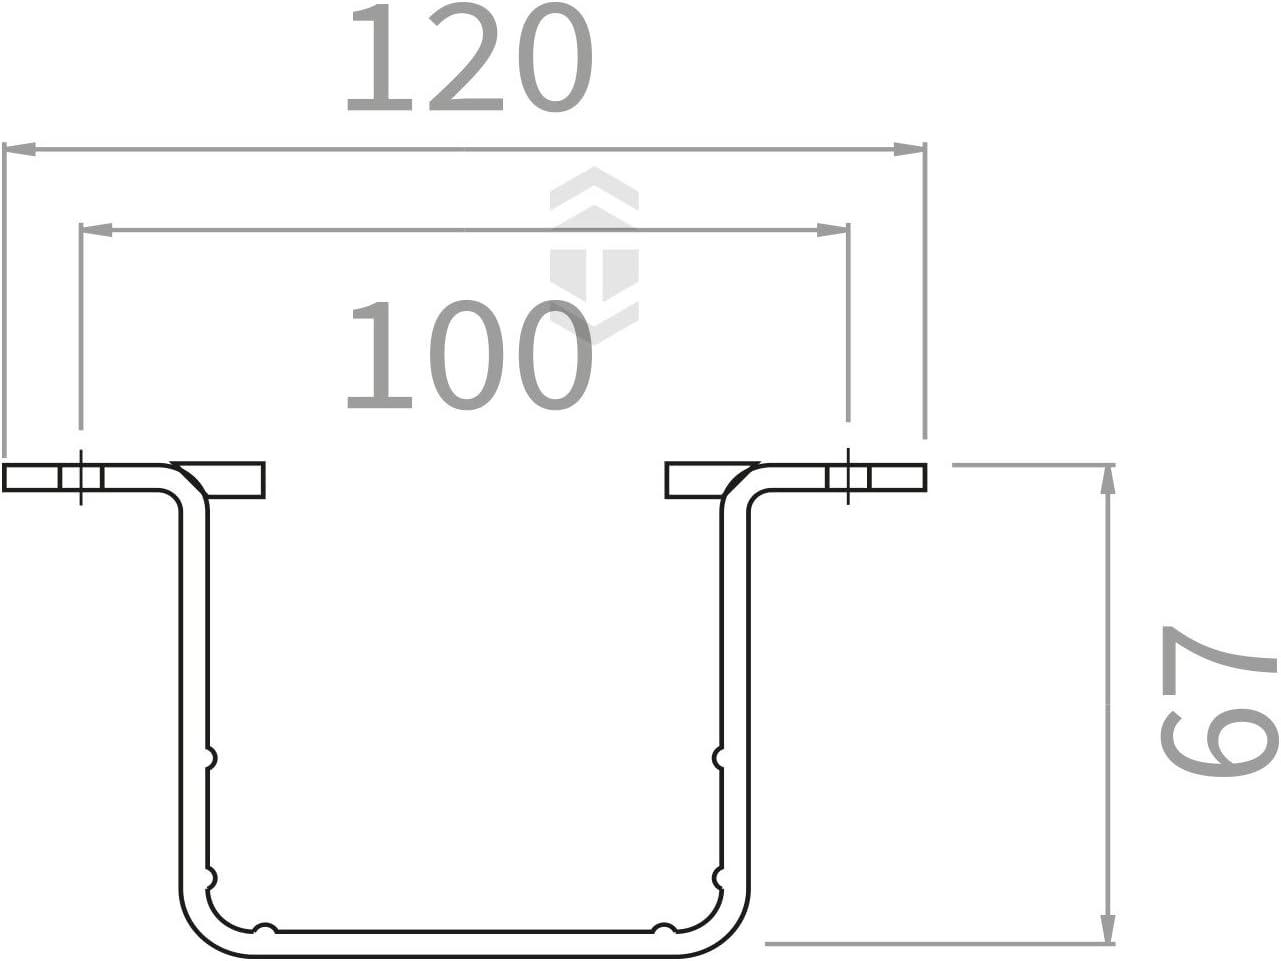 Marshall Tufflex uPVC Plastic Rainwater Gutter System Flush White Marshal Tufflex RWSC2WH Square Downpipe Clip